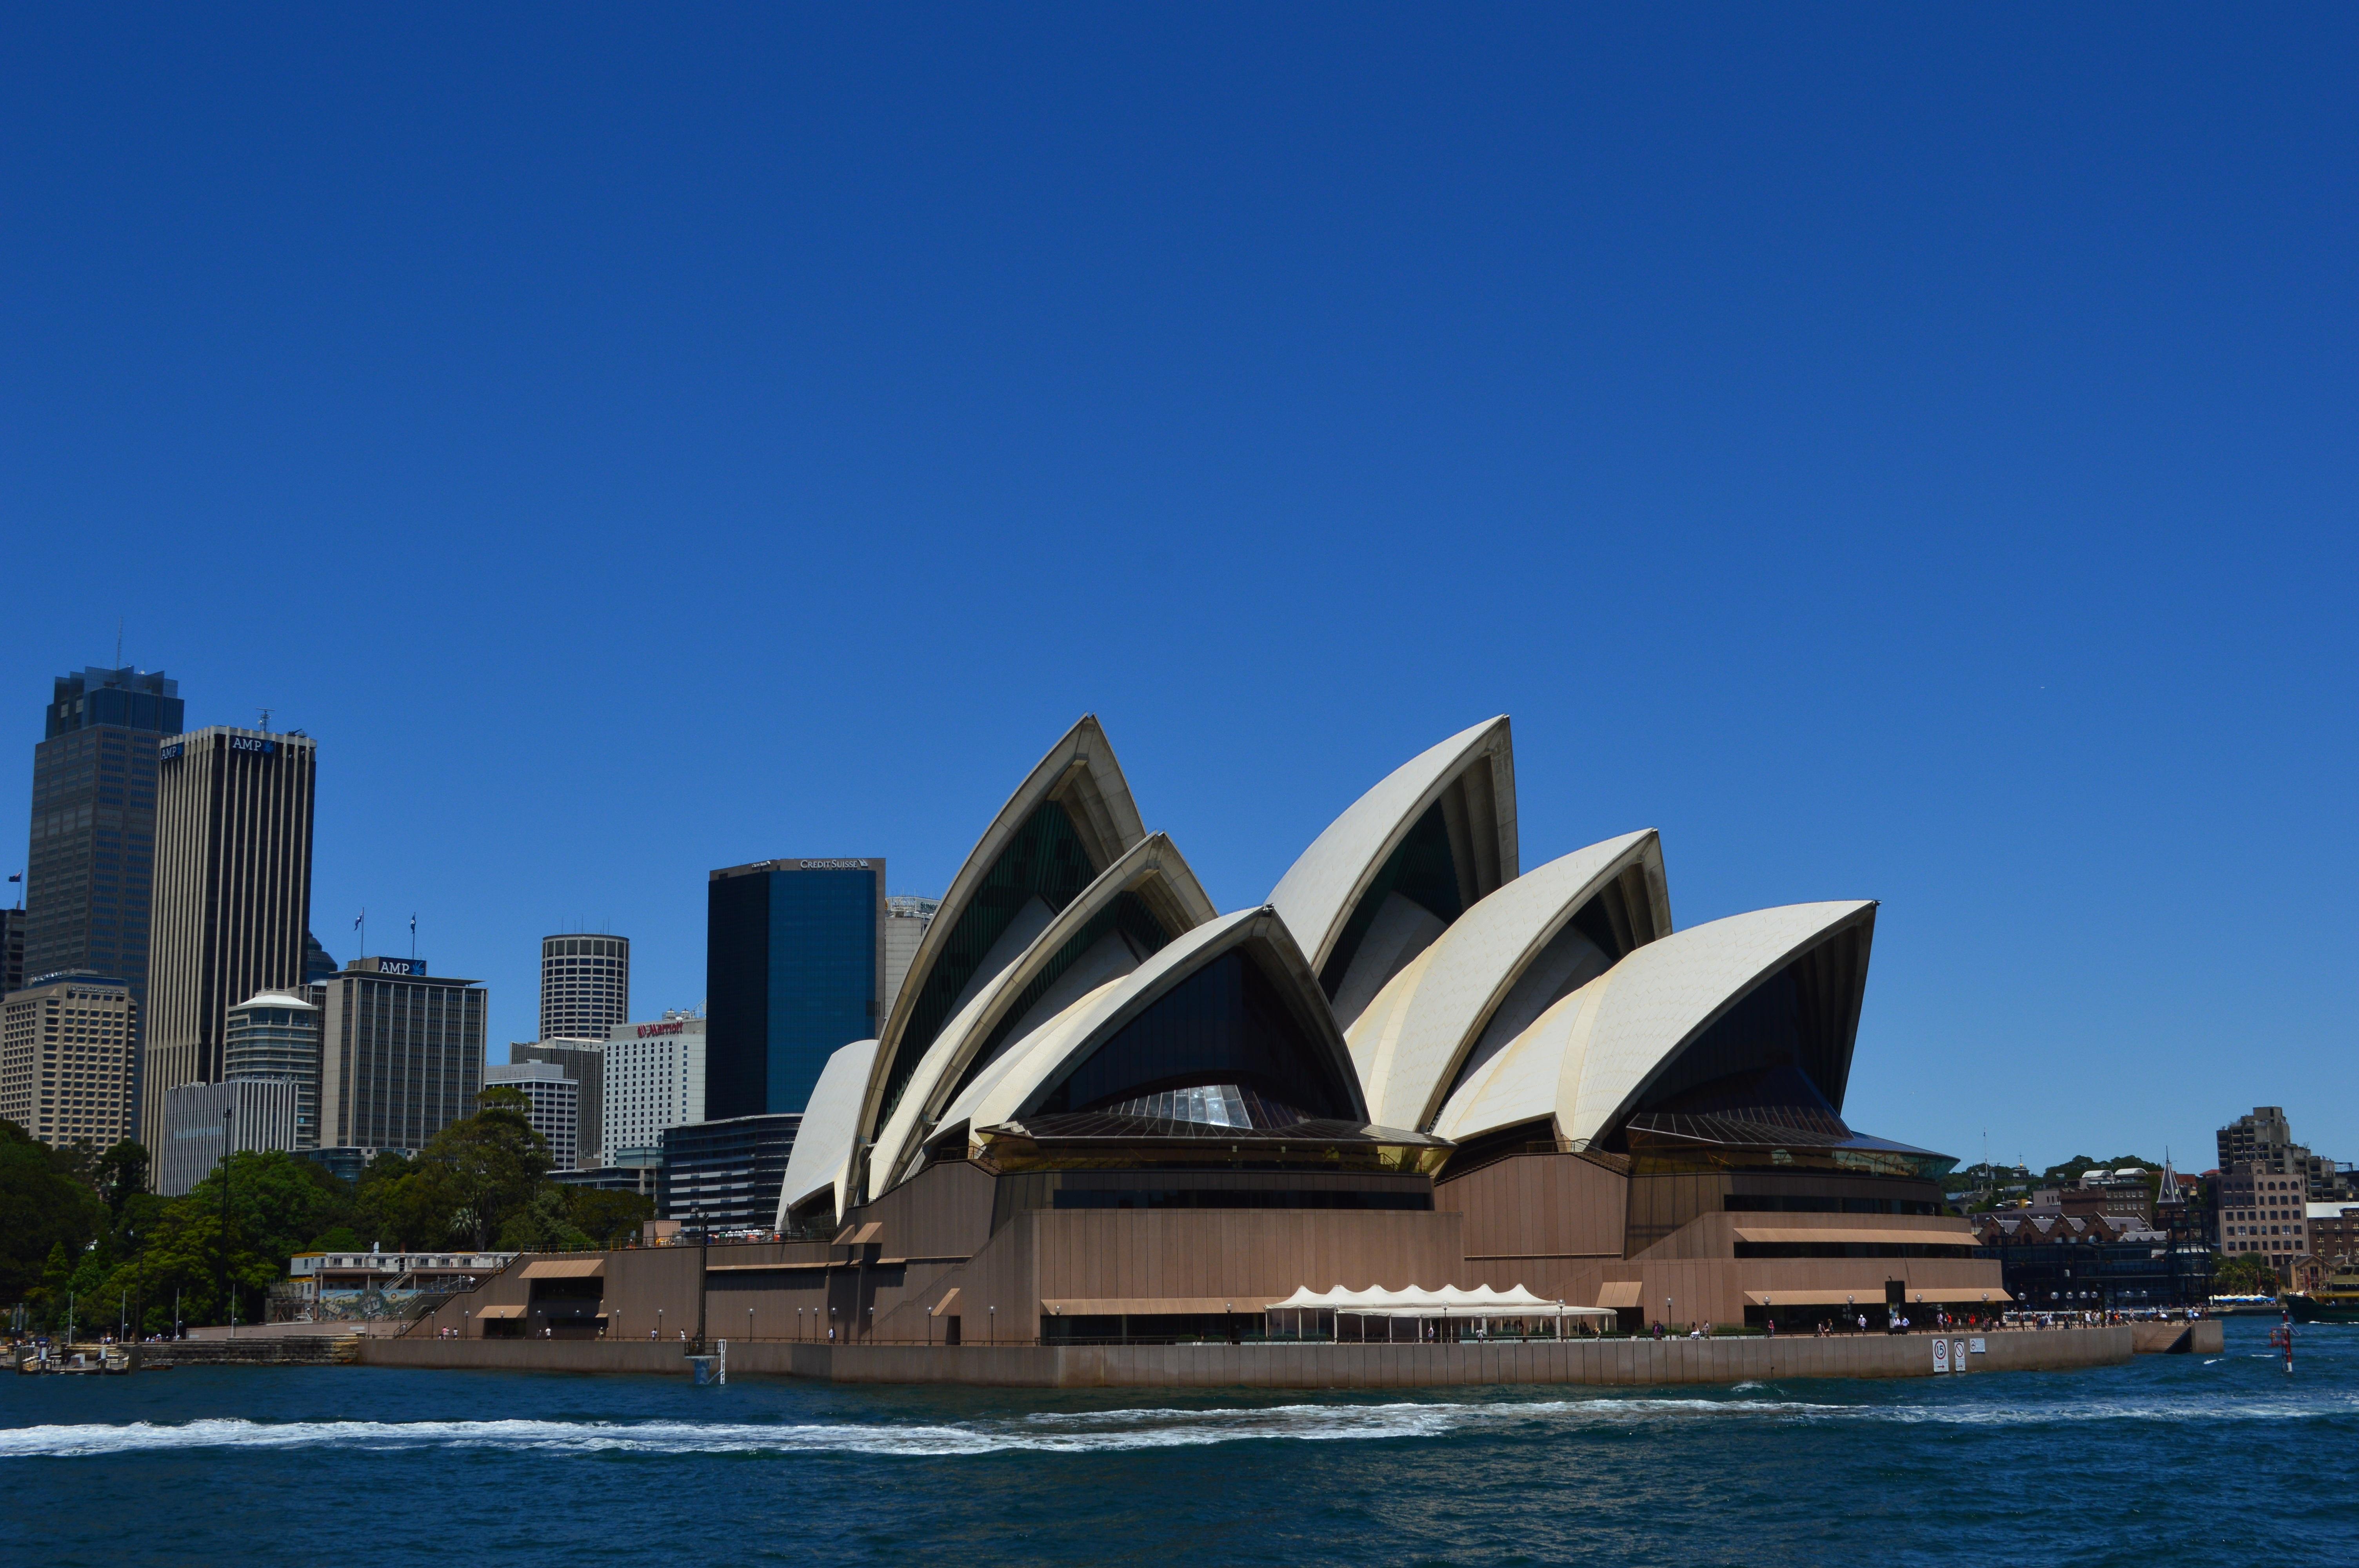 sea architecture skyline building skyscraper sydney opera opera house landmark australia tiles operahouse 607410 - Get Sydney Opera House Photo Download  Gif